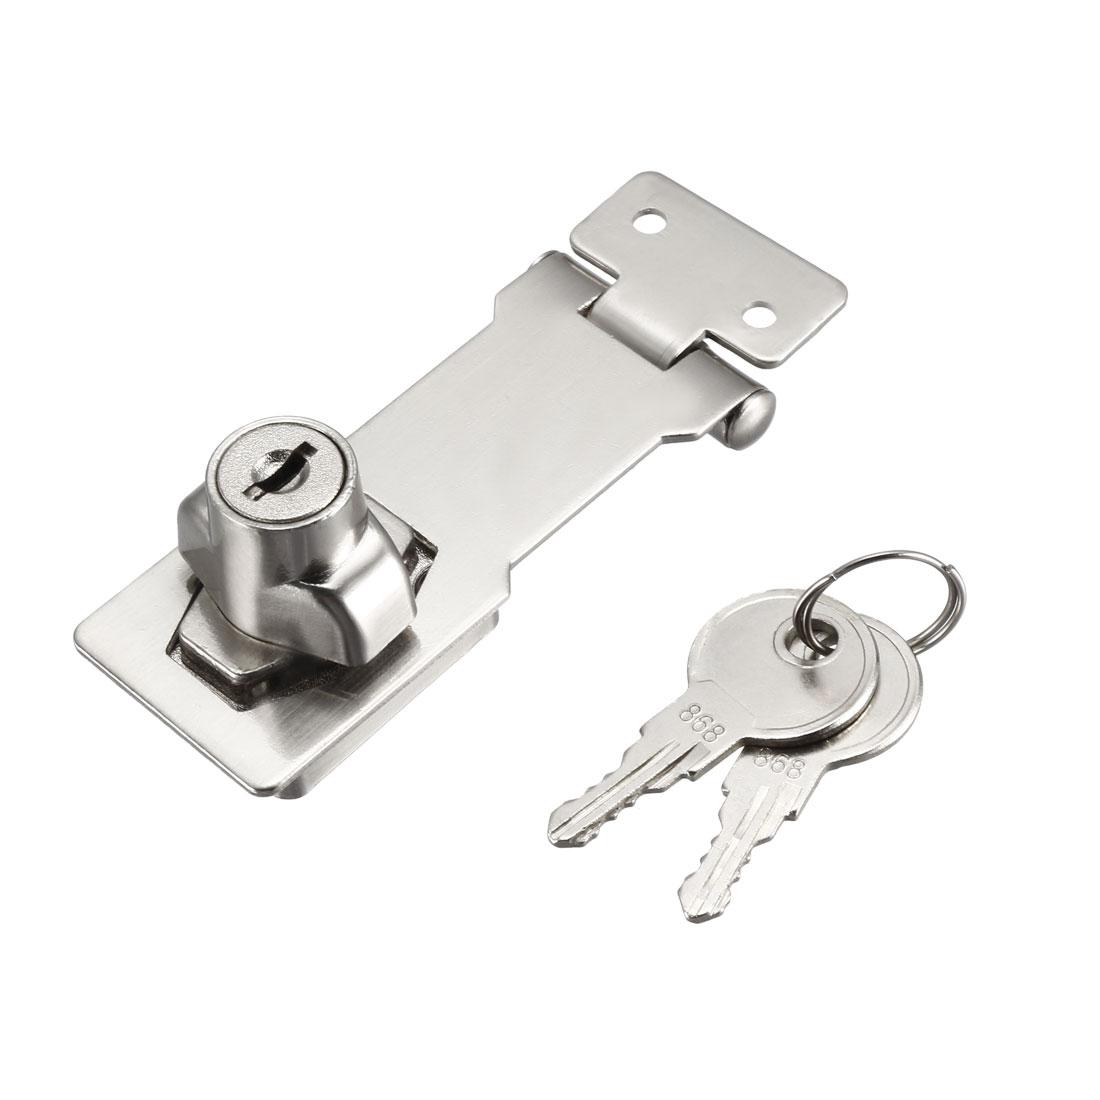 Keyed Hasp Lock 94mm Twist Knob Keyed Locking Hasp Silver Tone